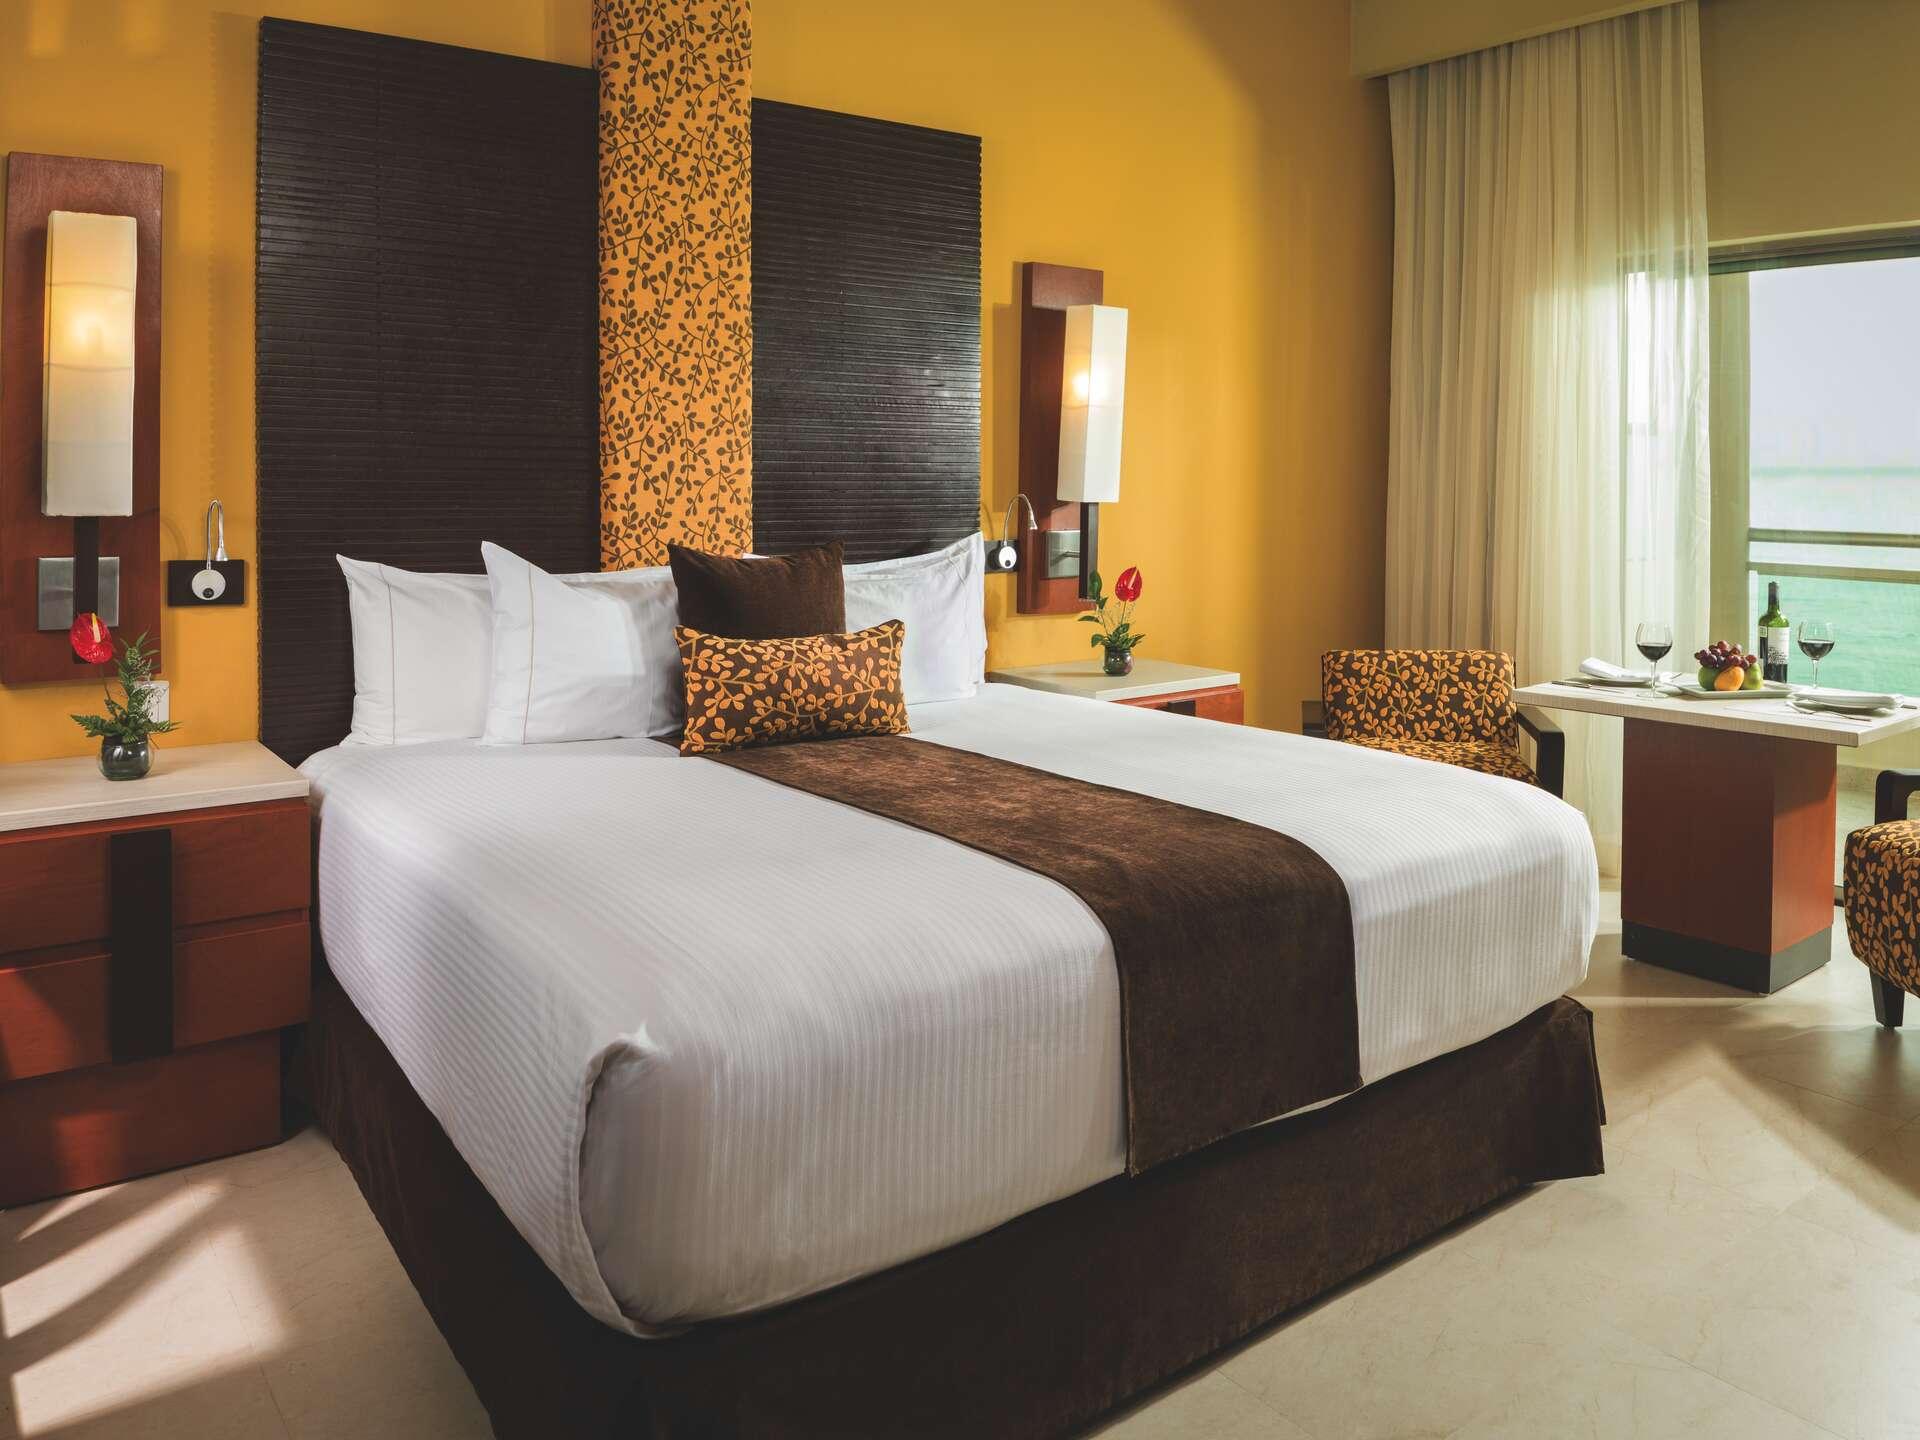 Luxury vacation rentals mexico - Riviera maya - Generations riviera maya - 2 BDM Oceanfront Swim-Up - Image 1/11